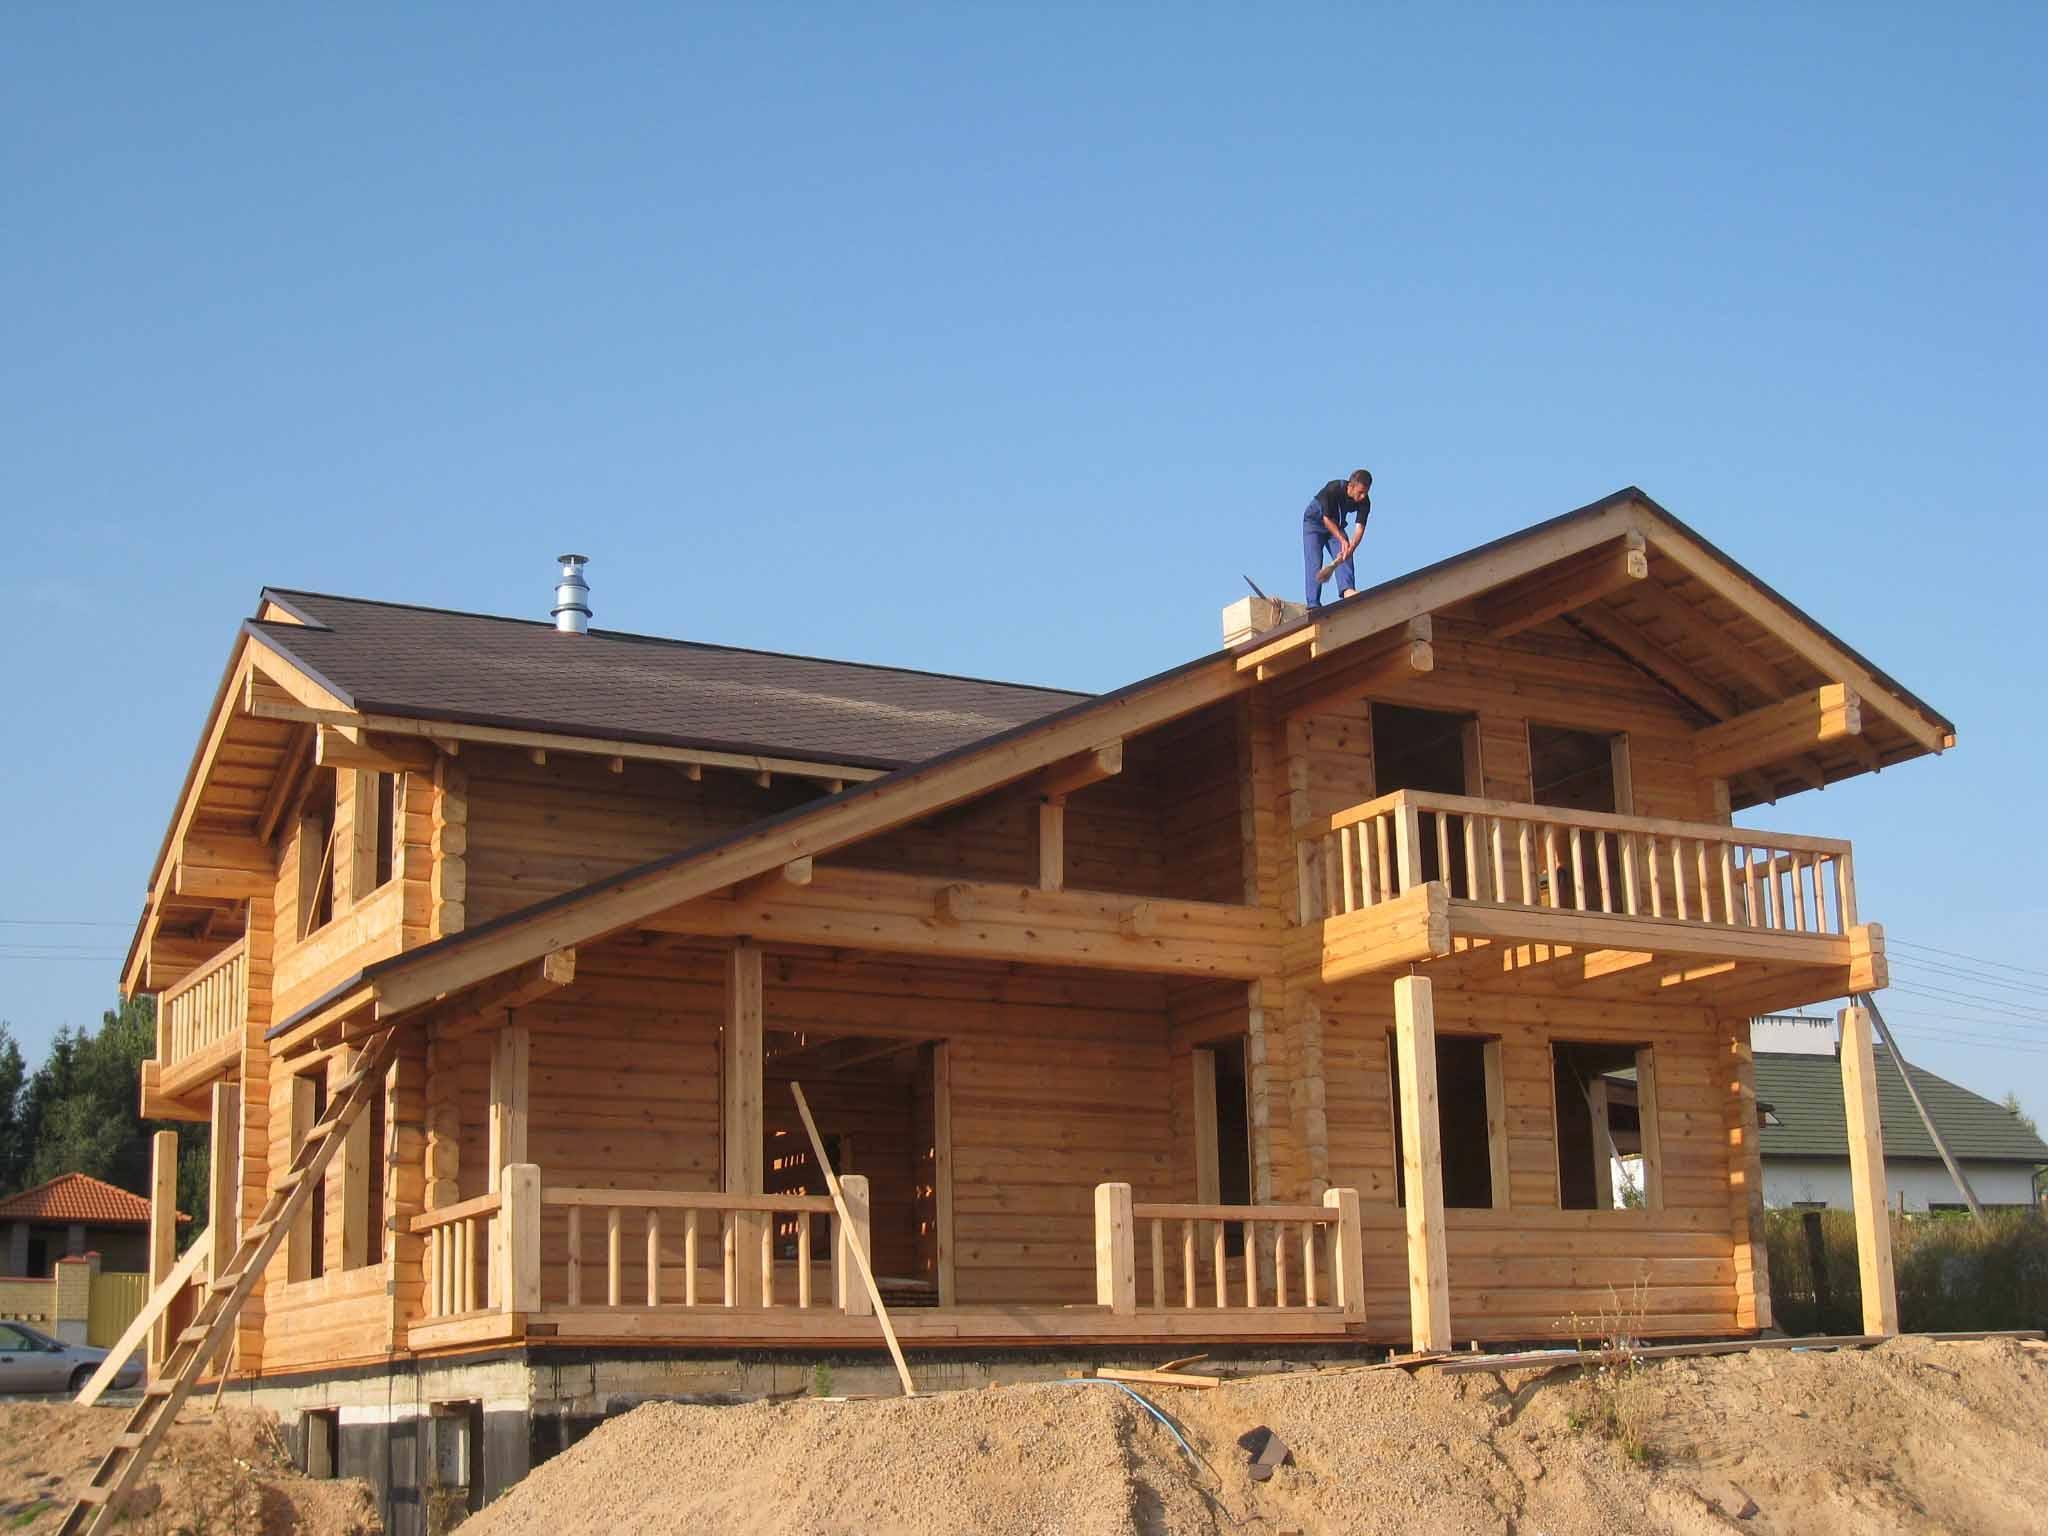 Casa de madera imagui - Casaa de madera ...